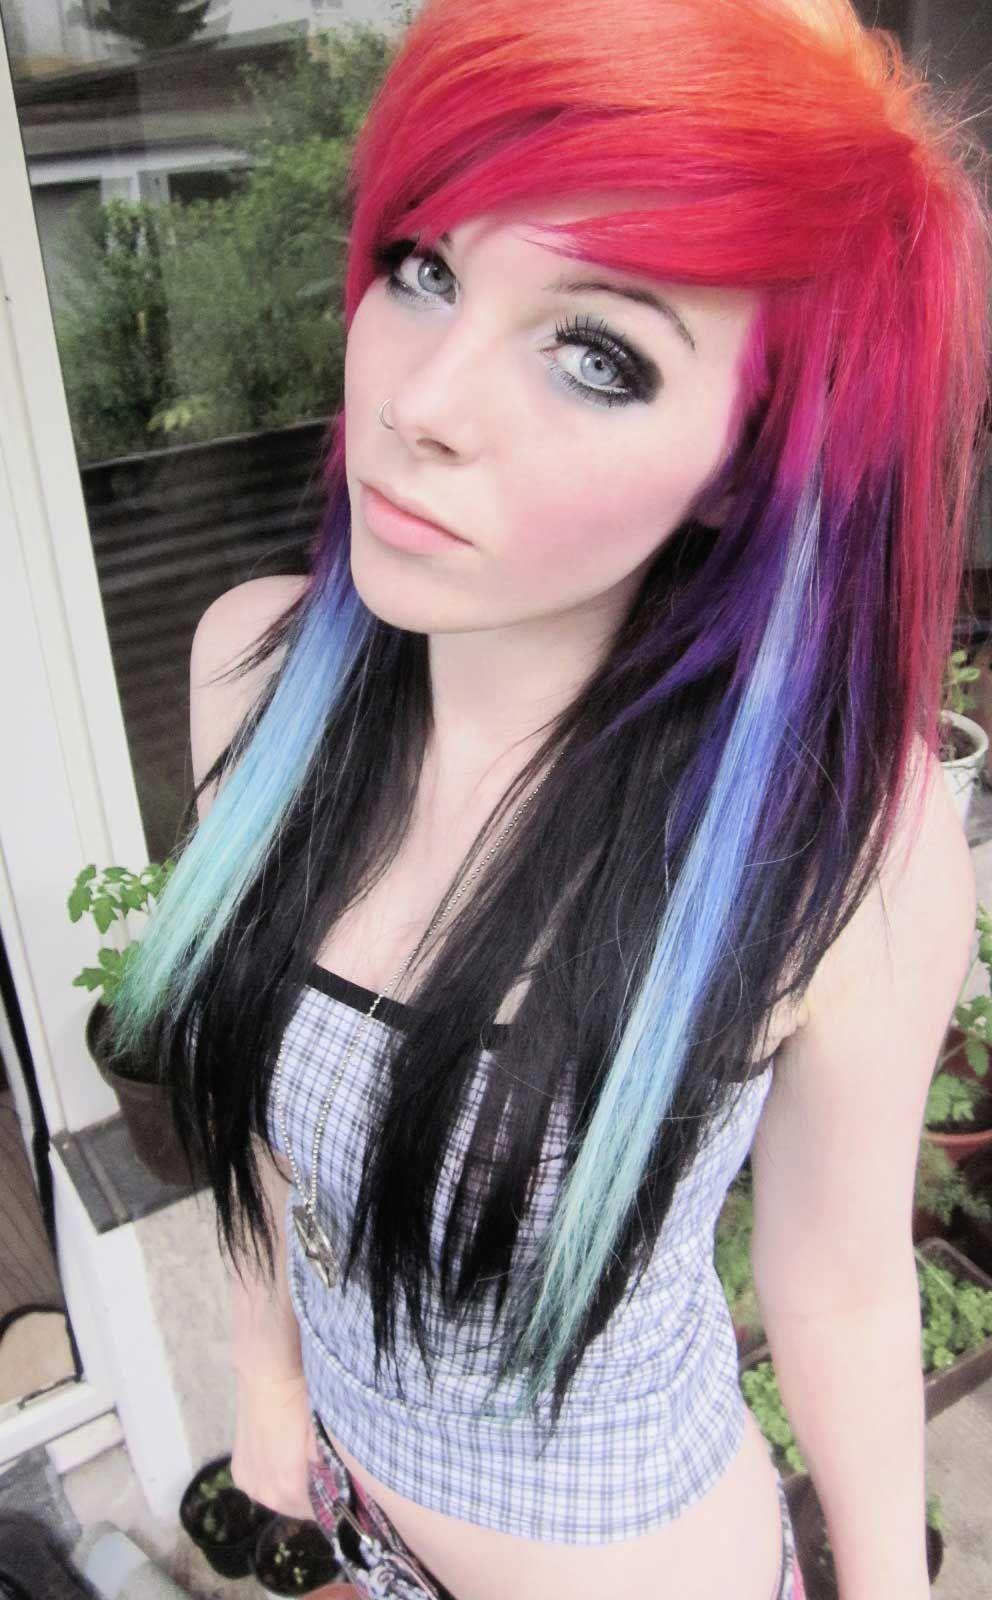 Superb Nice Pattern Emo Girl Ira Vampira Scene Queen Colorful Hair Purple Hairstyles For Women Draintrainus